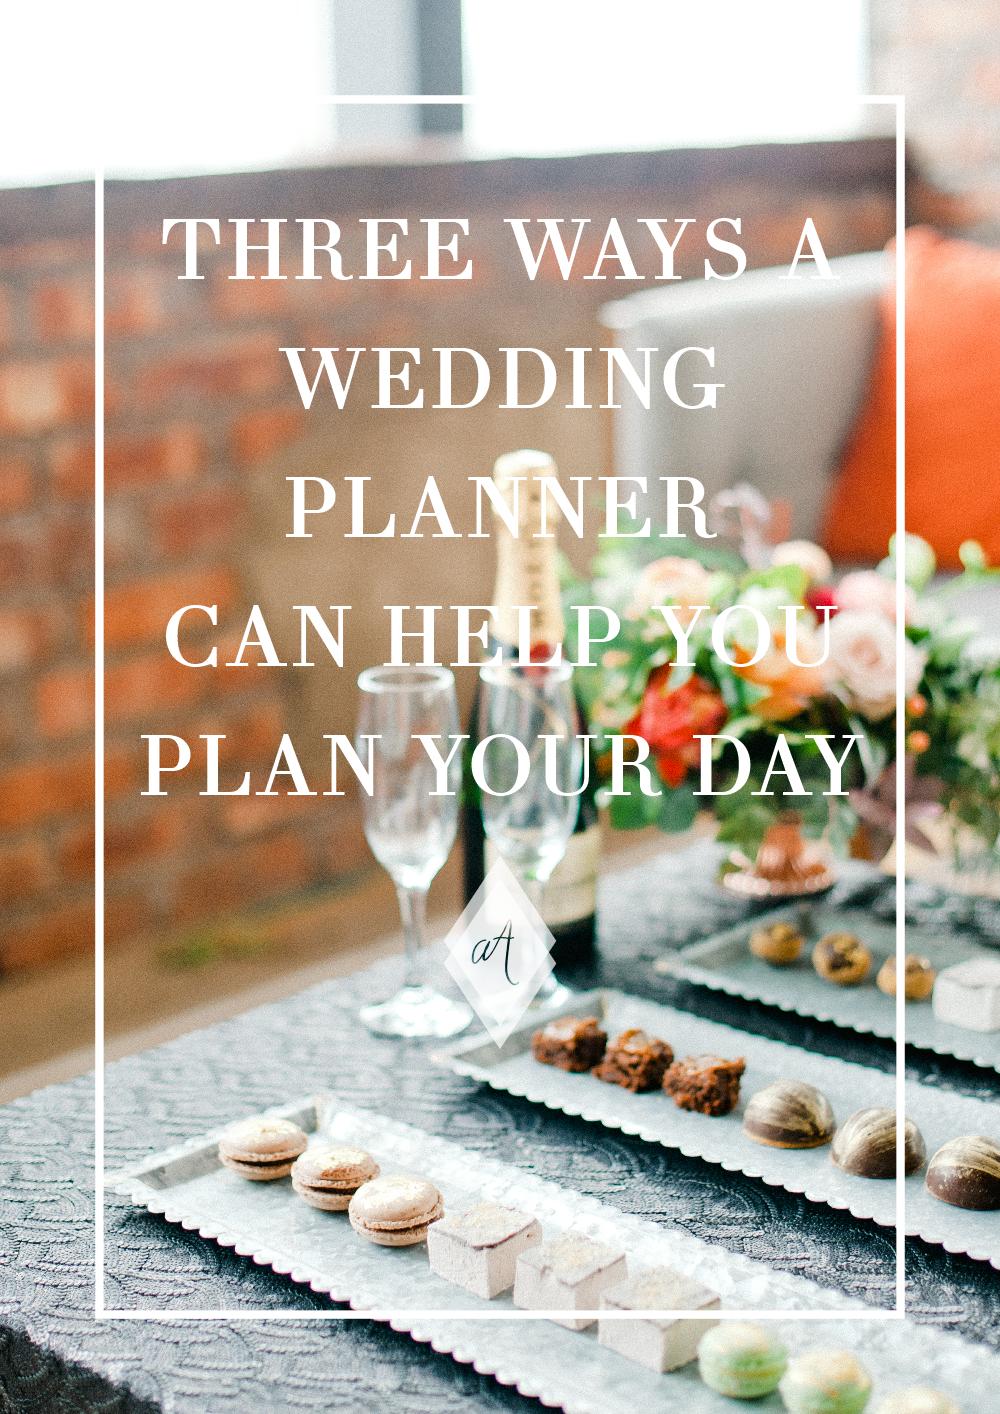 three ways a wedding planner can help you plan your wedding